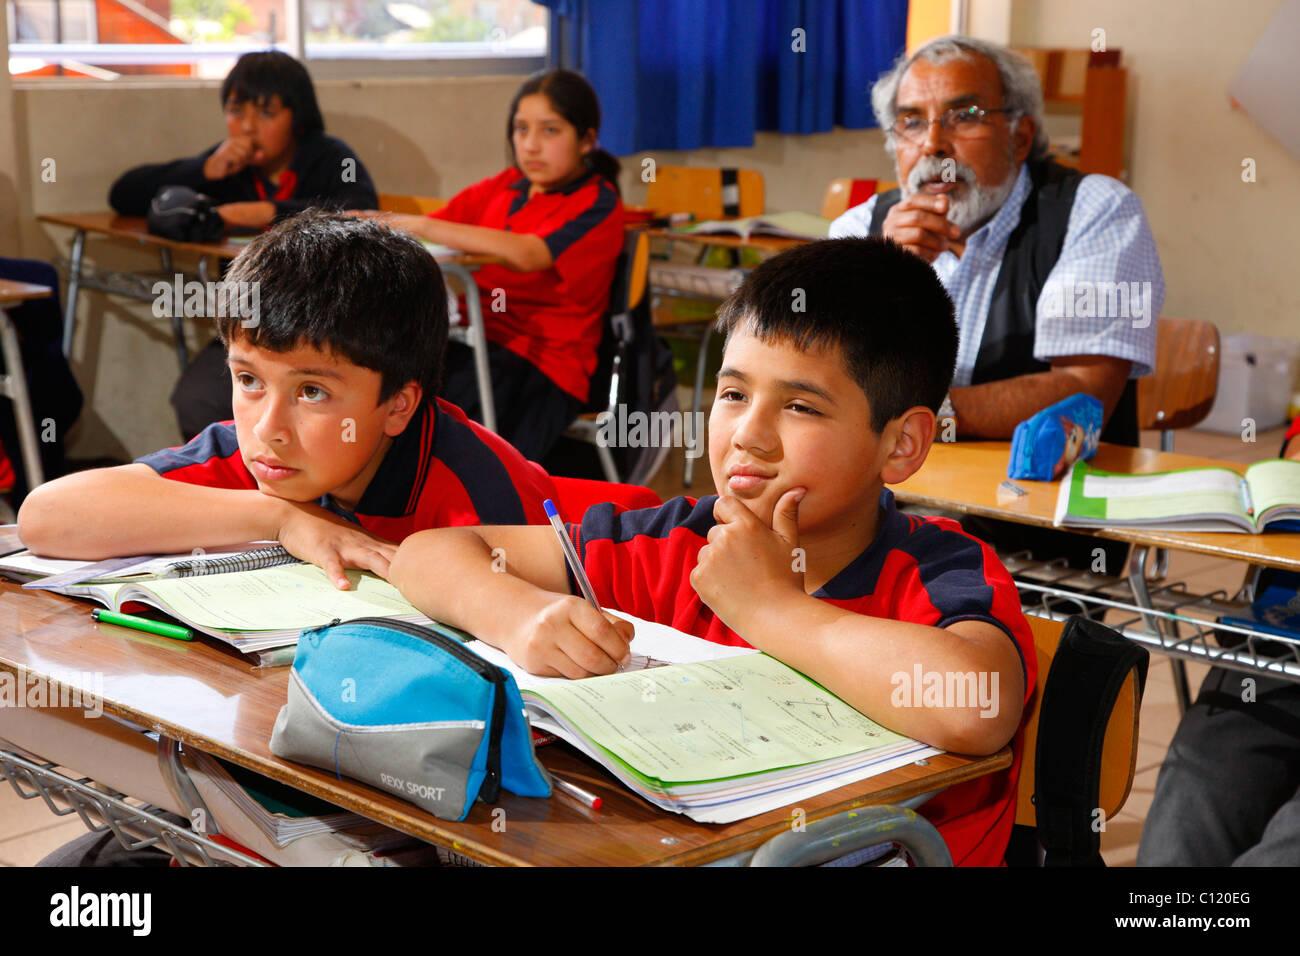 Pupils during class, Belem school, Santiago de Chile, Chile, South America - Stock Image